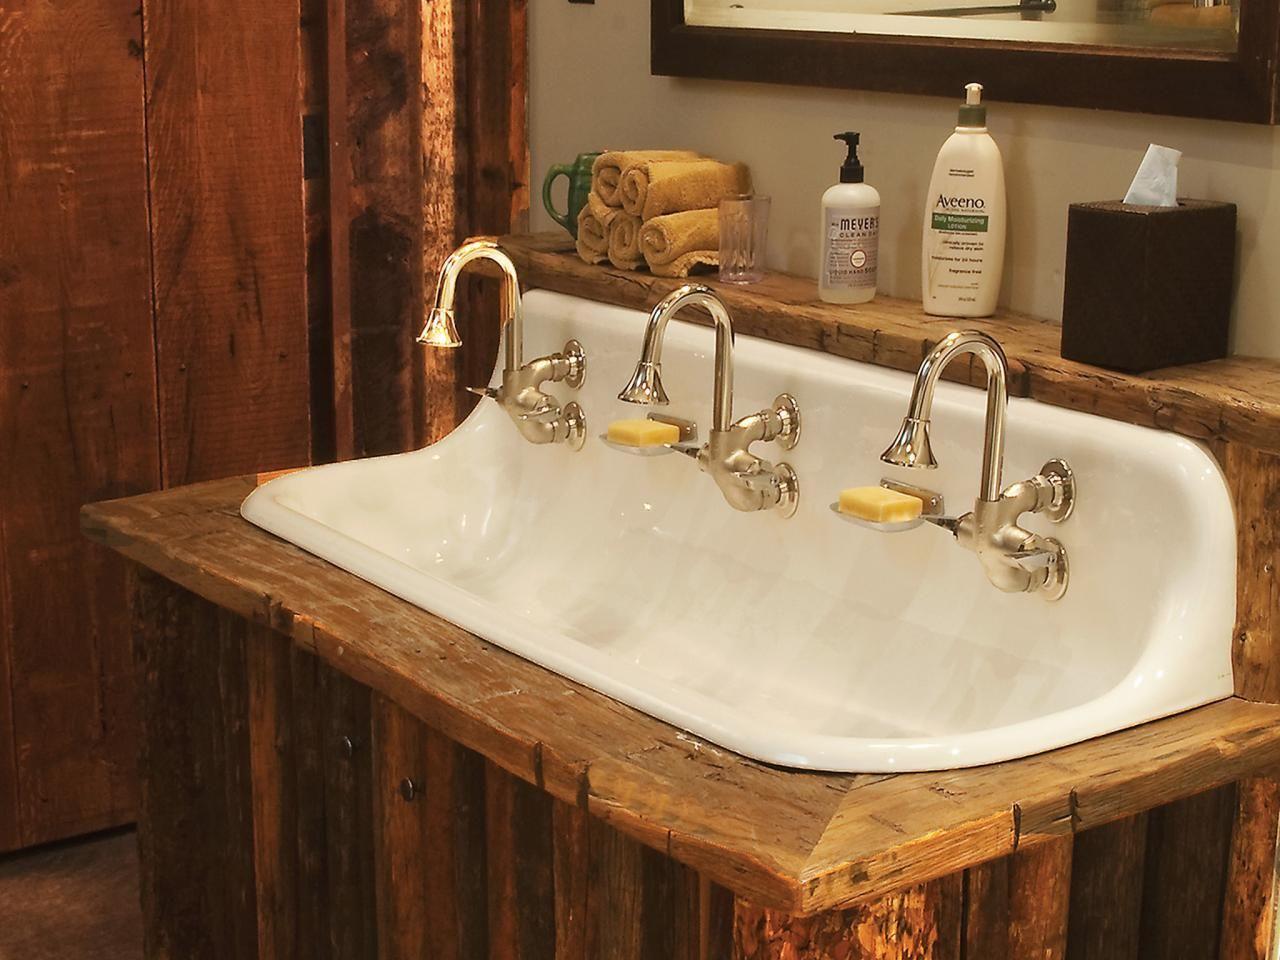 Antique Bathroom Faucets | Faucet, Bathroom designs and Sinks